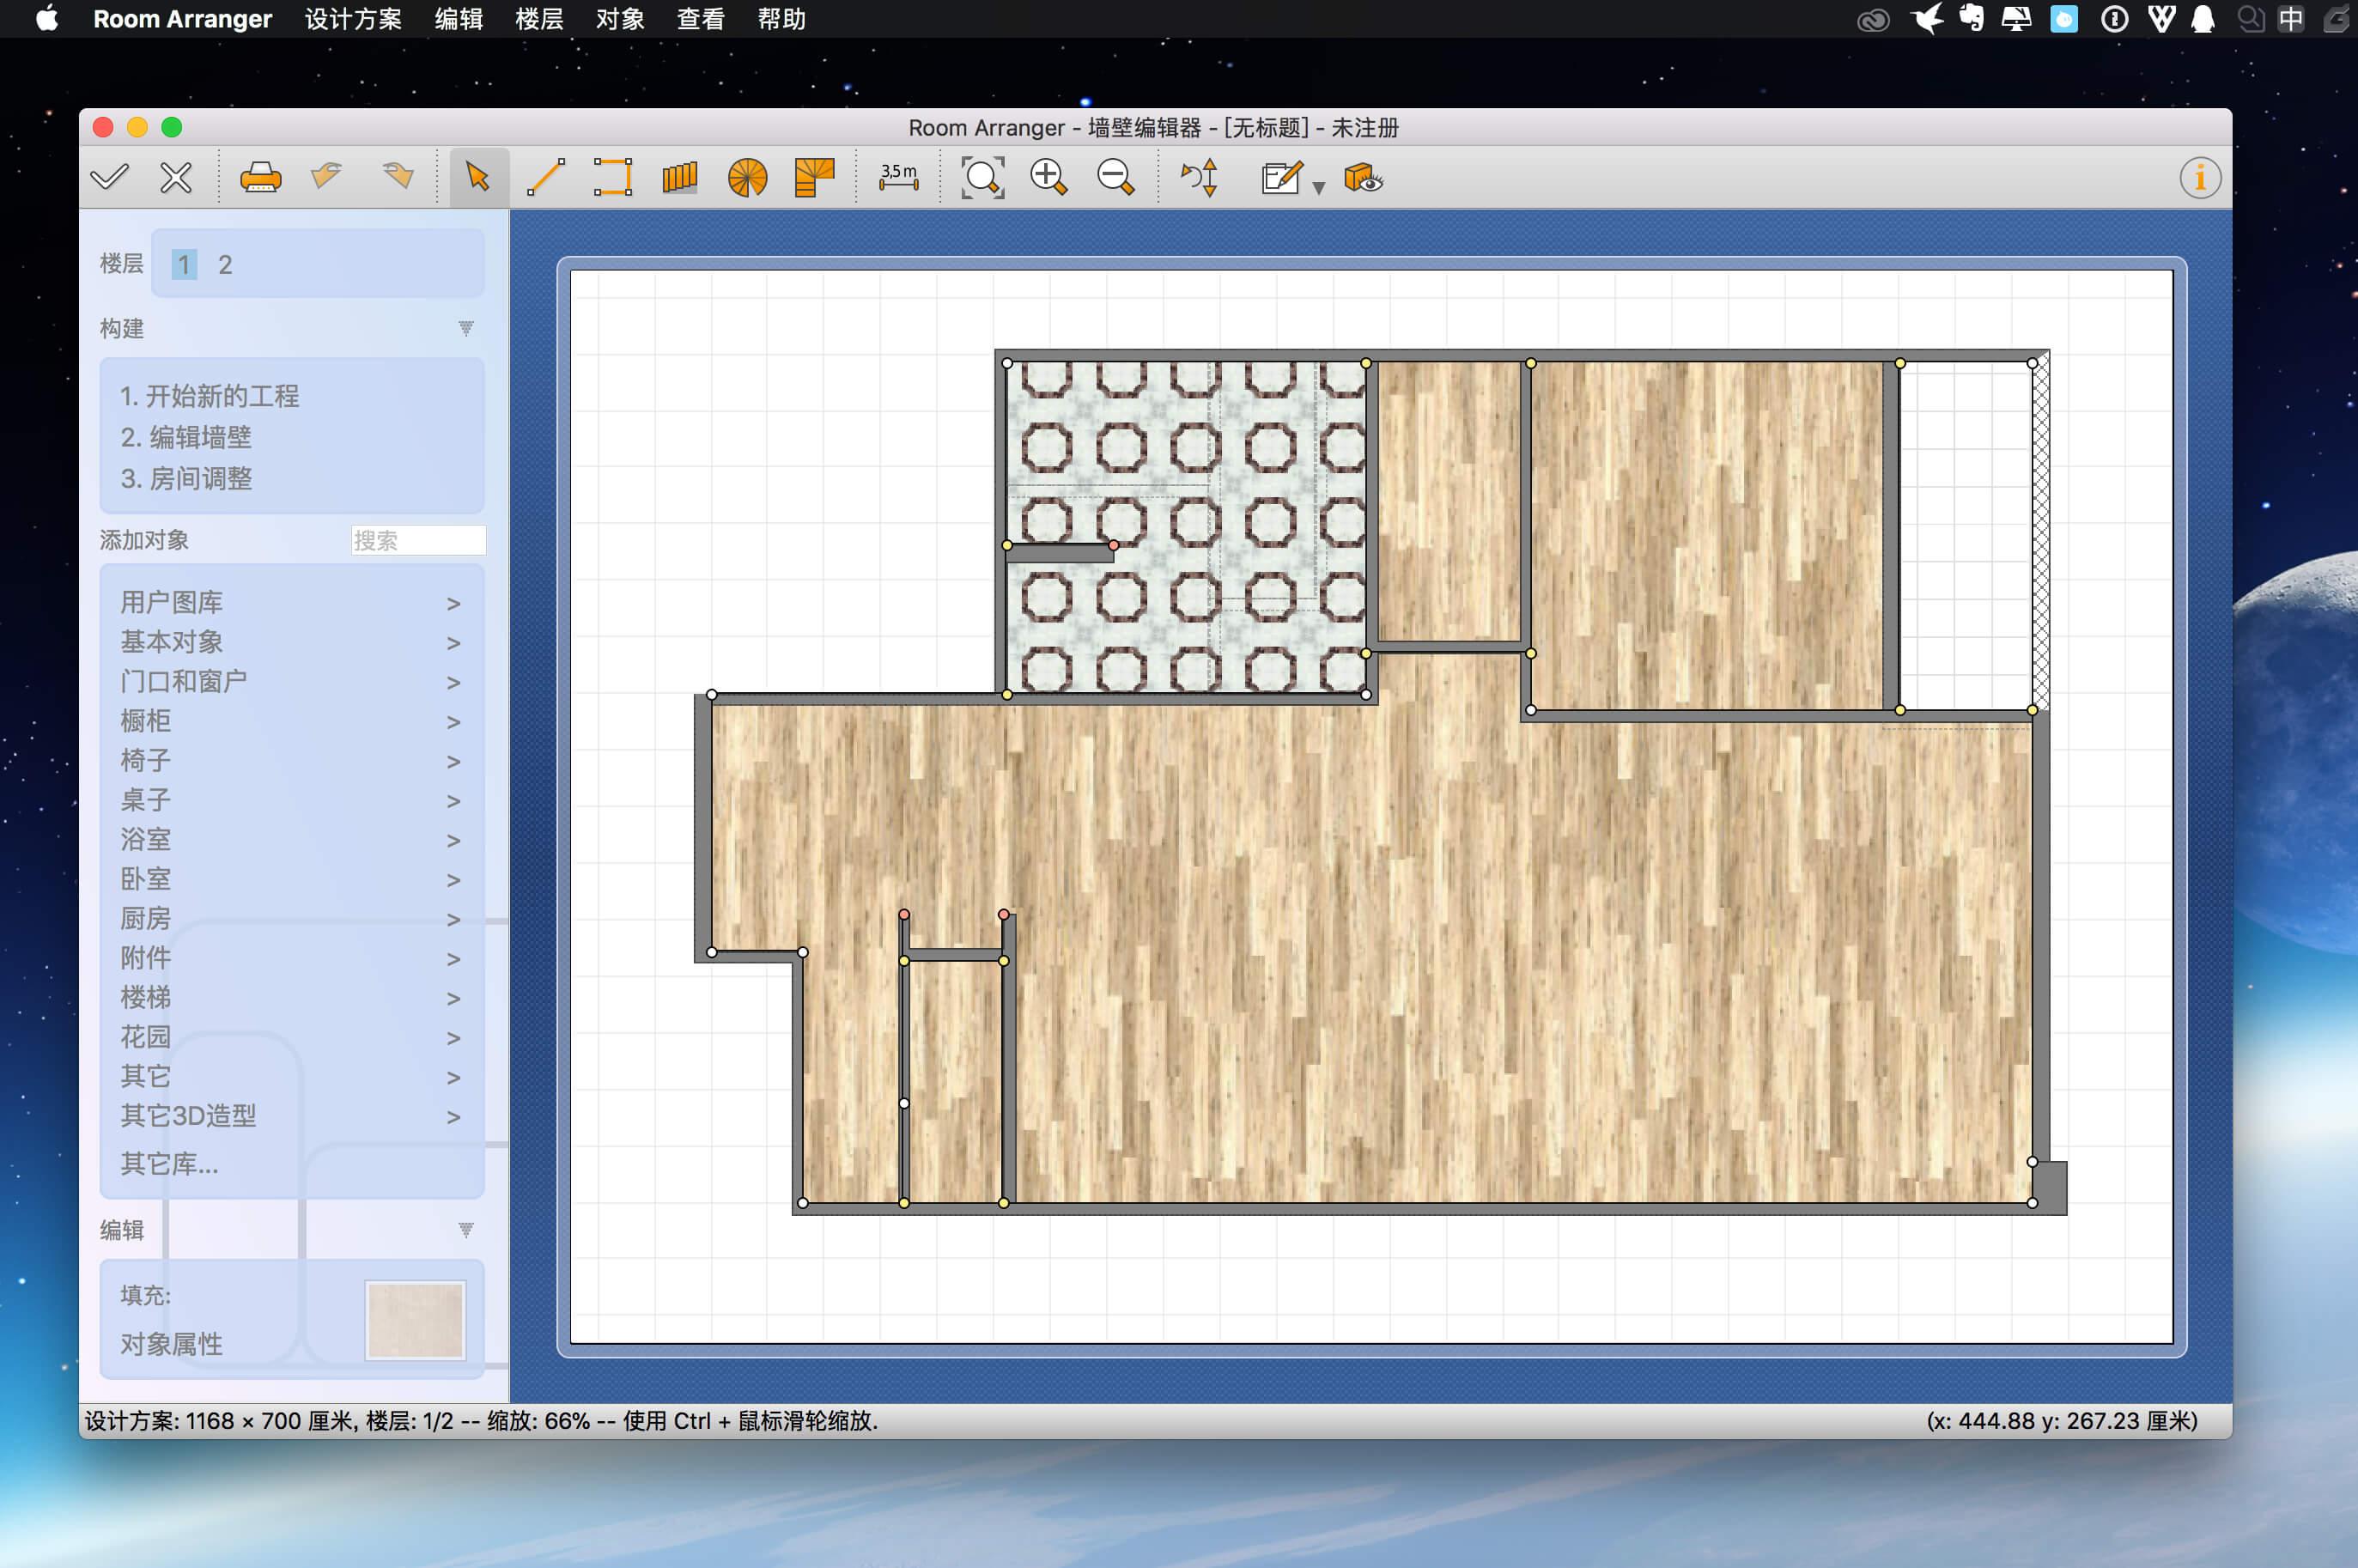 Room Arranger 9.5.5房屋户型图设计工具